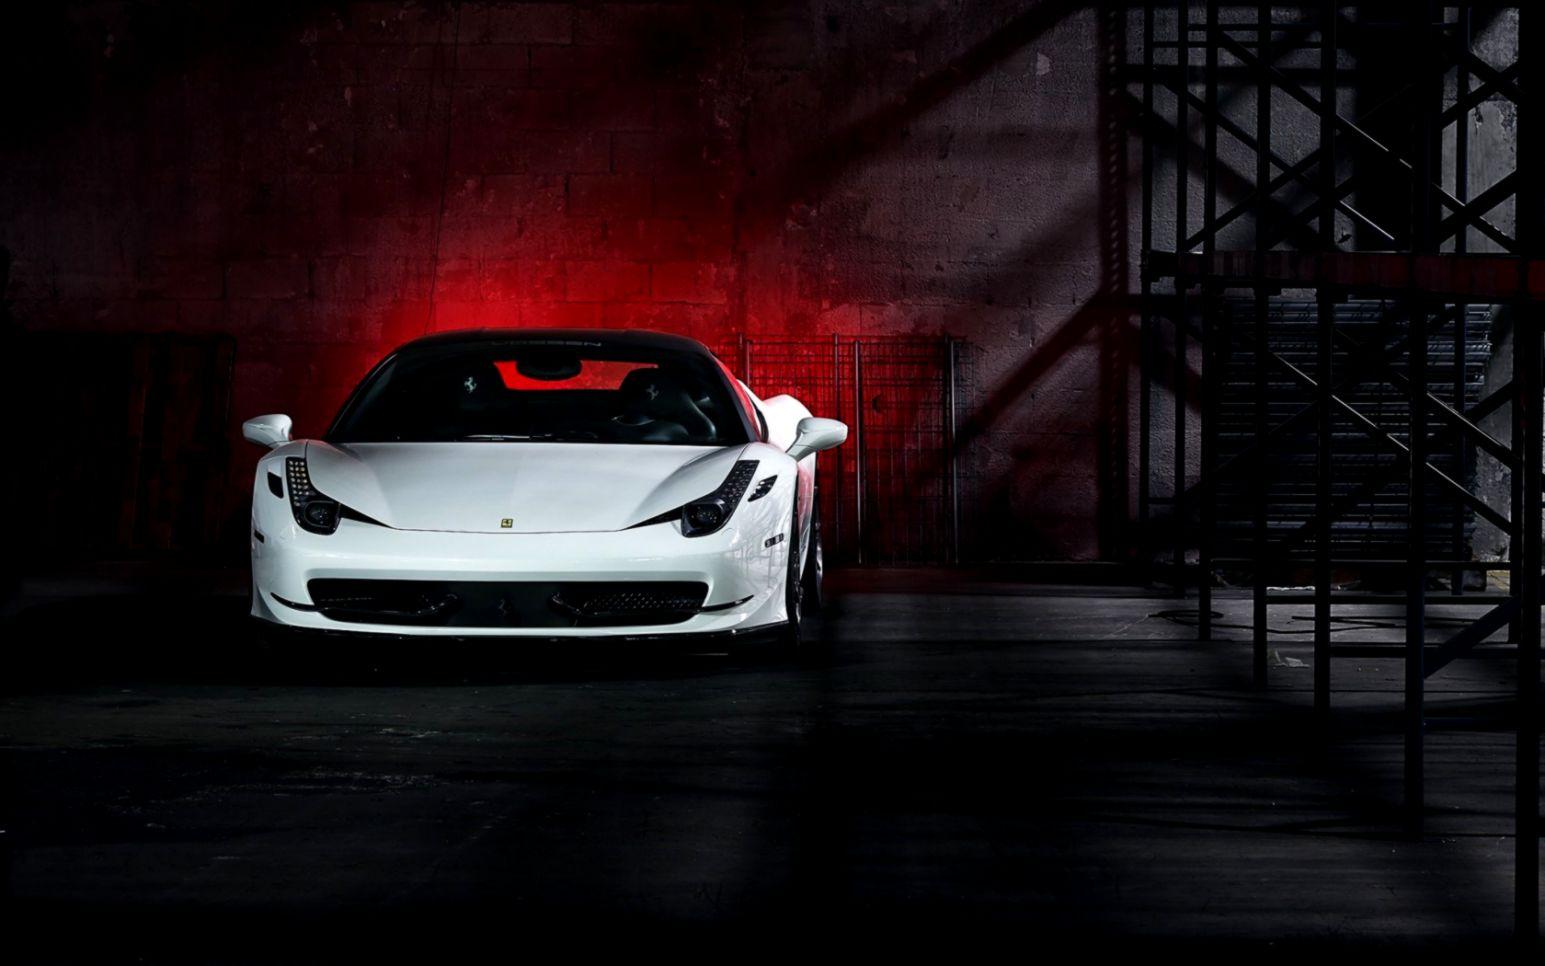 Ferrari 458 Italia White Car Hd Wallpaper   Free High ...